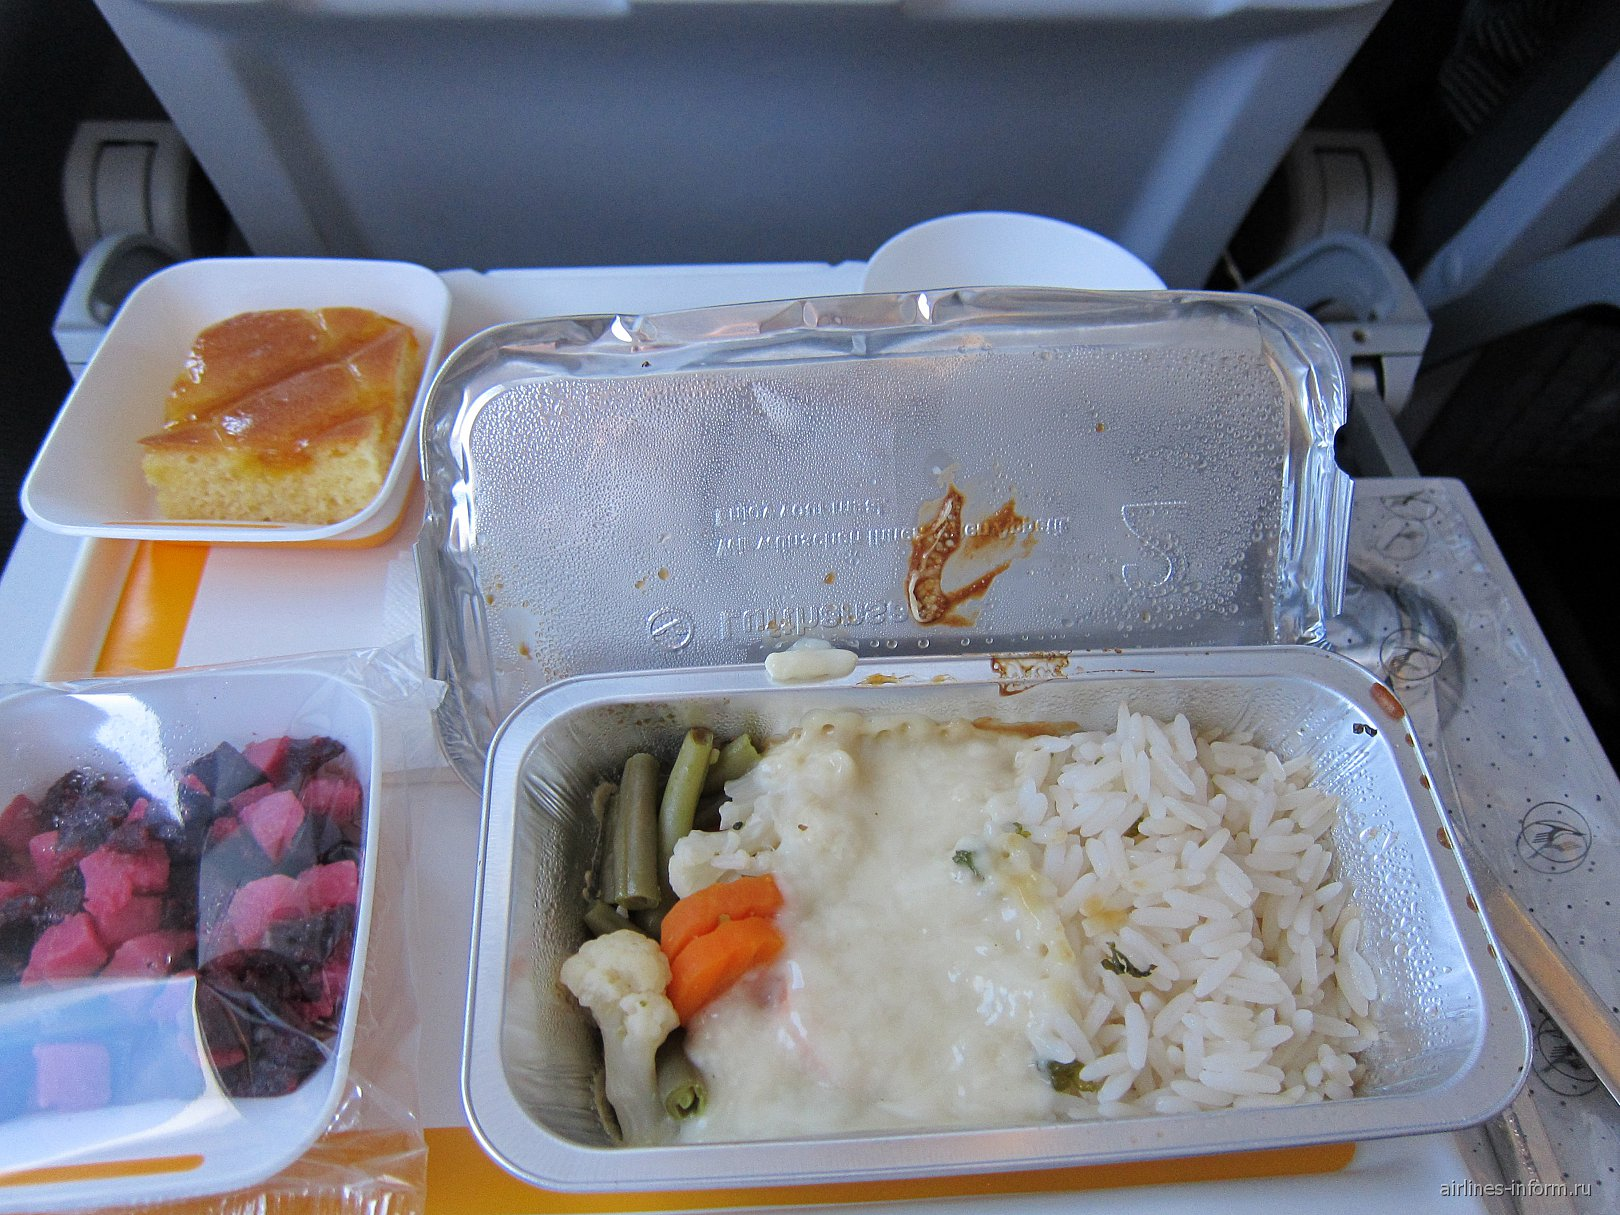 Питание на рейсе Москва-Франкфурт авиакомпании Люфтганза